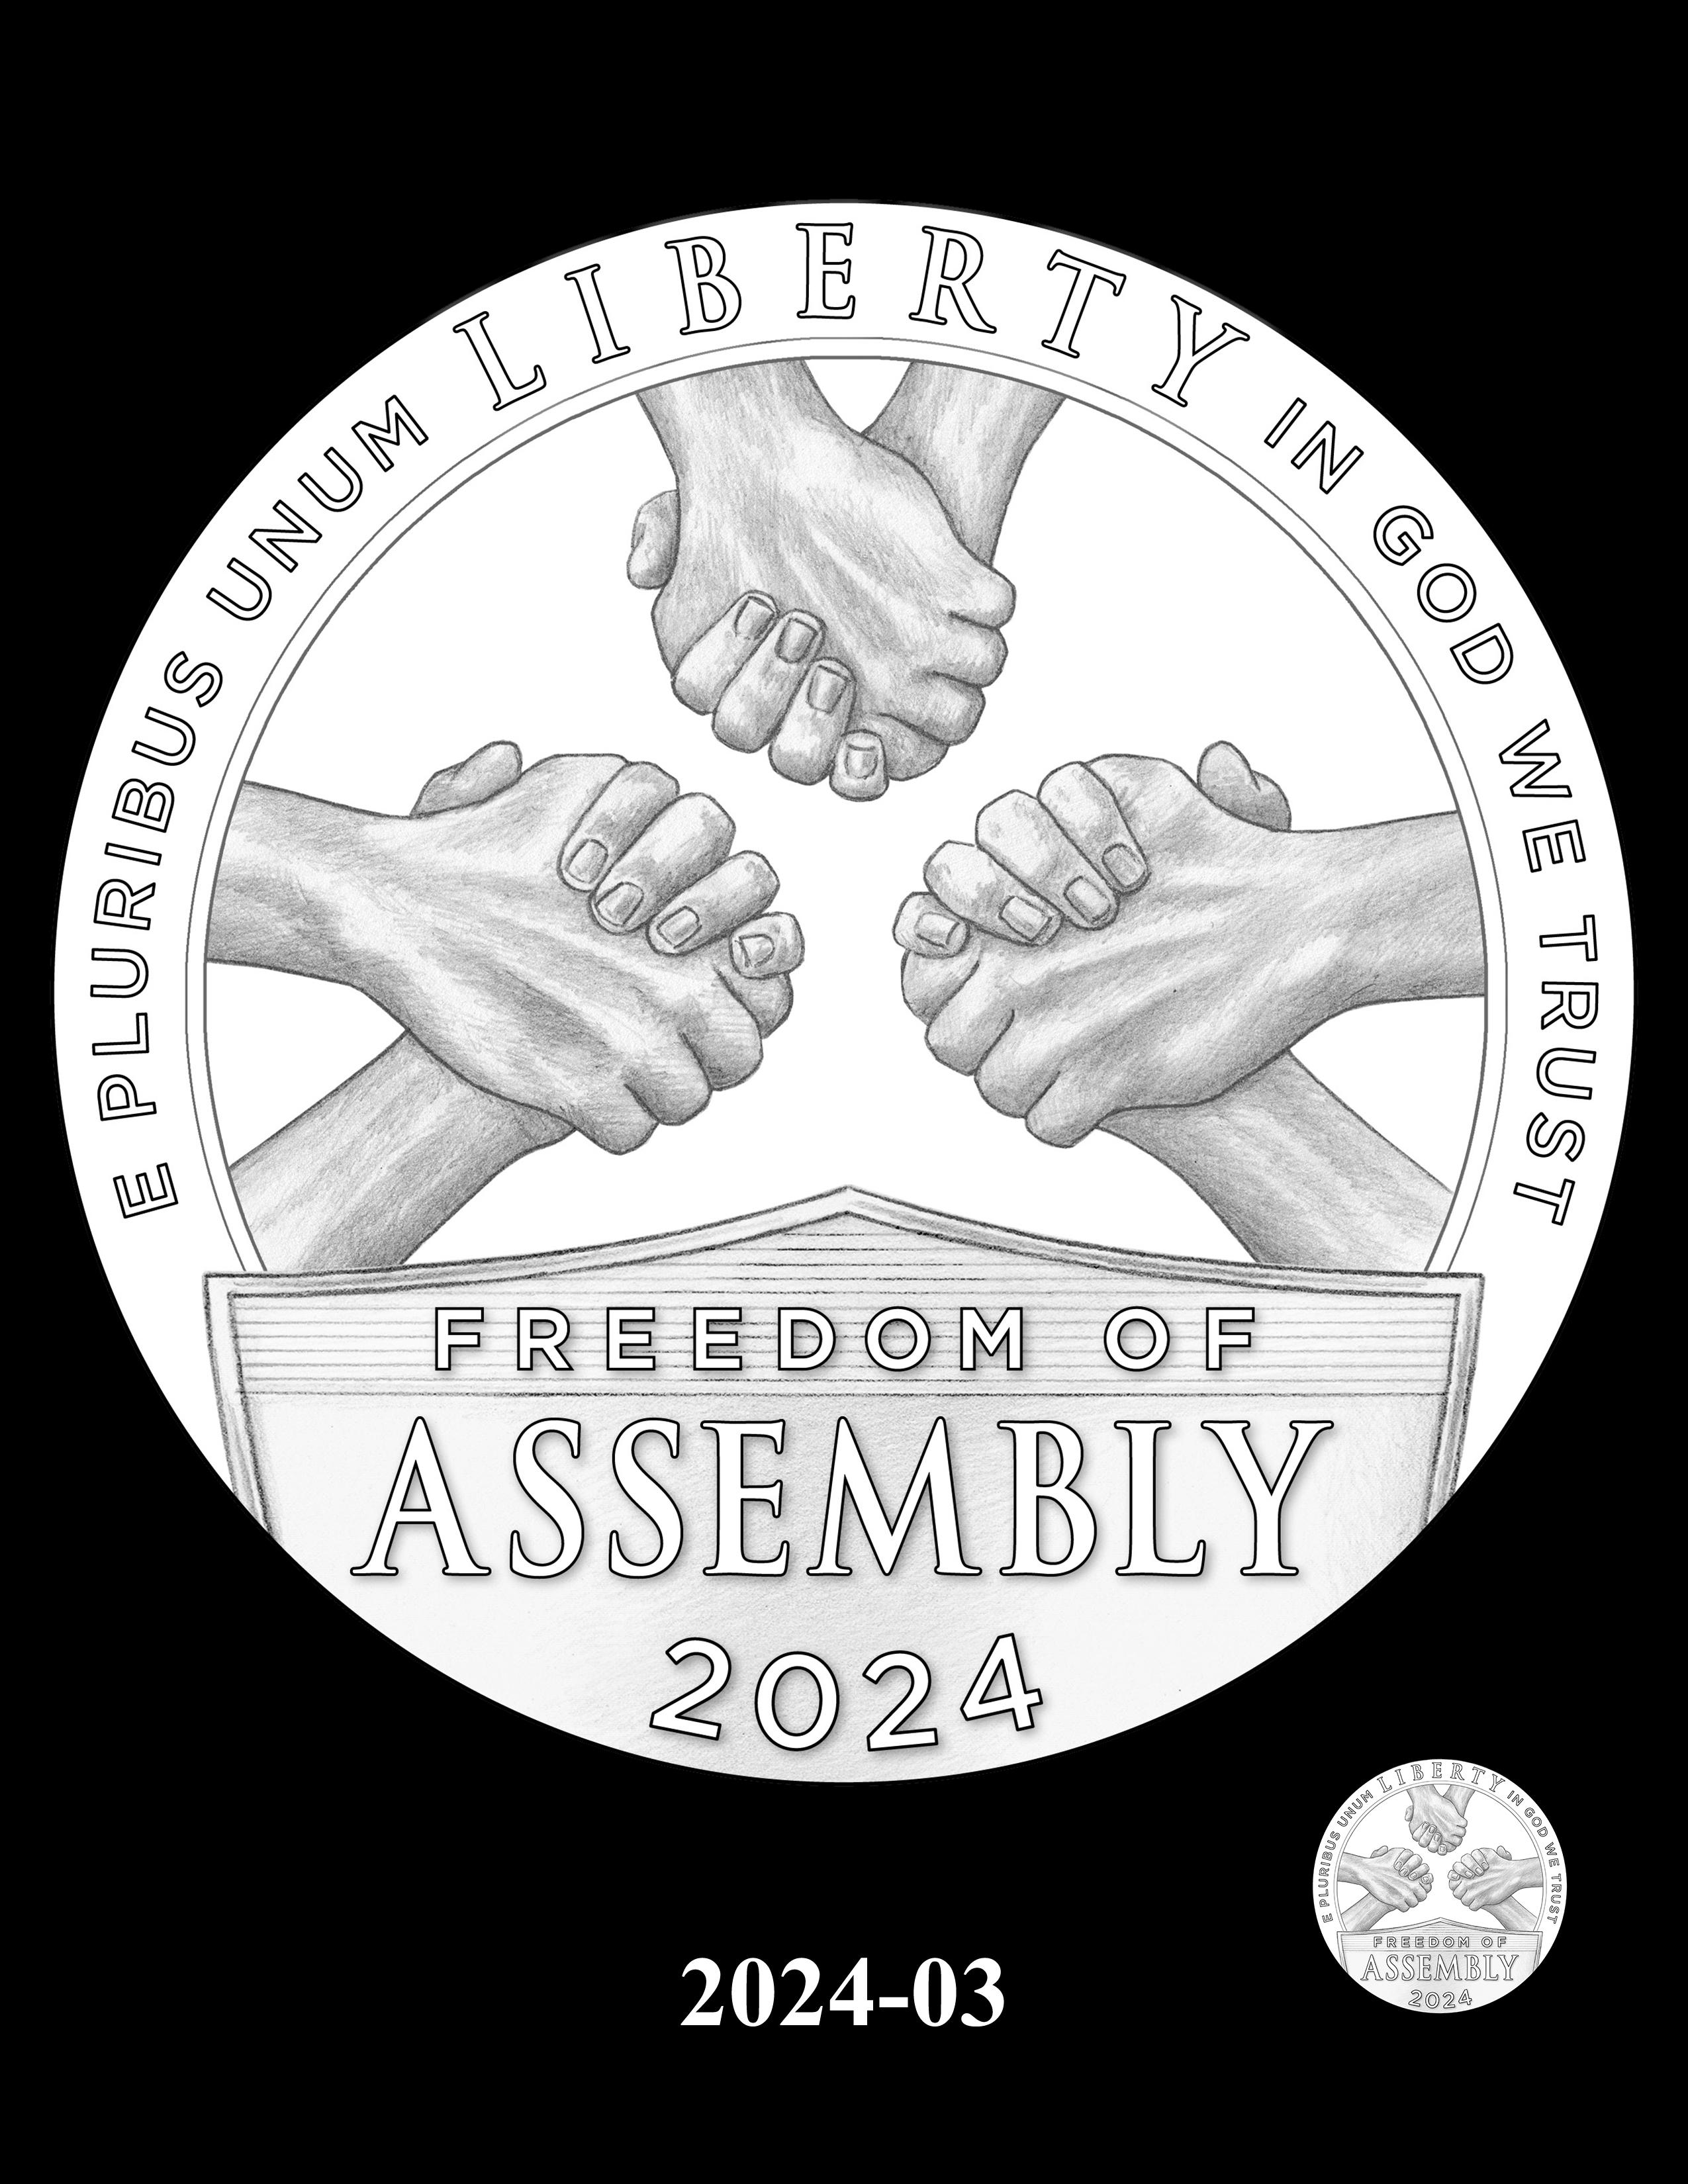 03-2024 -- 2021 - 2025 American Eagle Platinum Proof Program